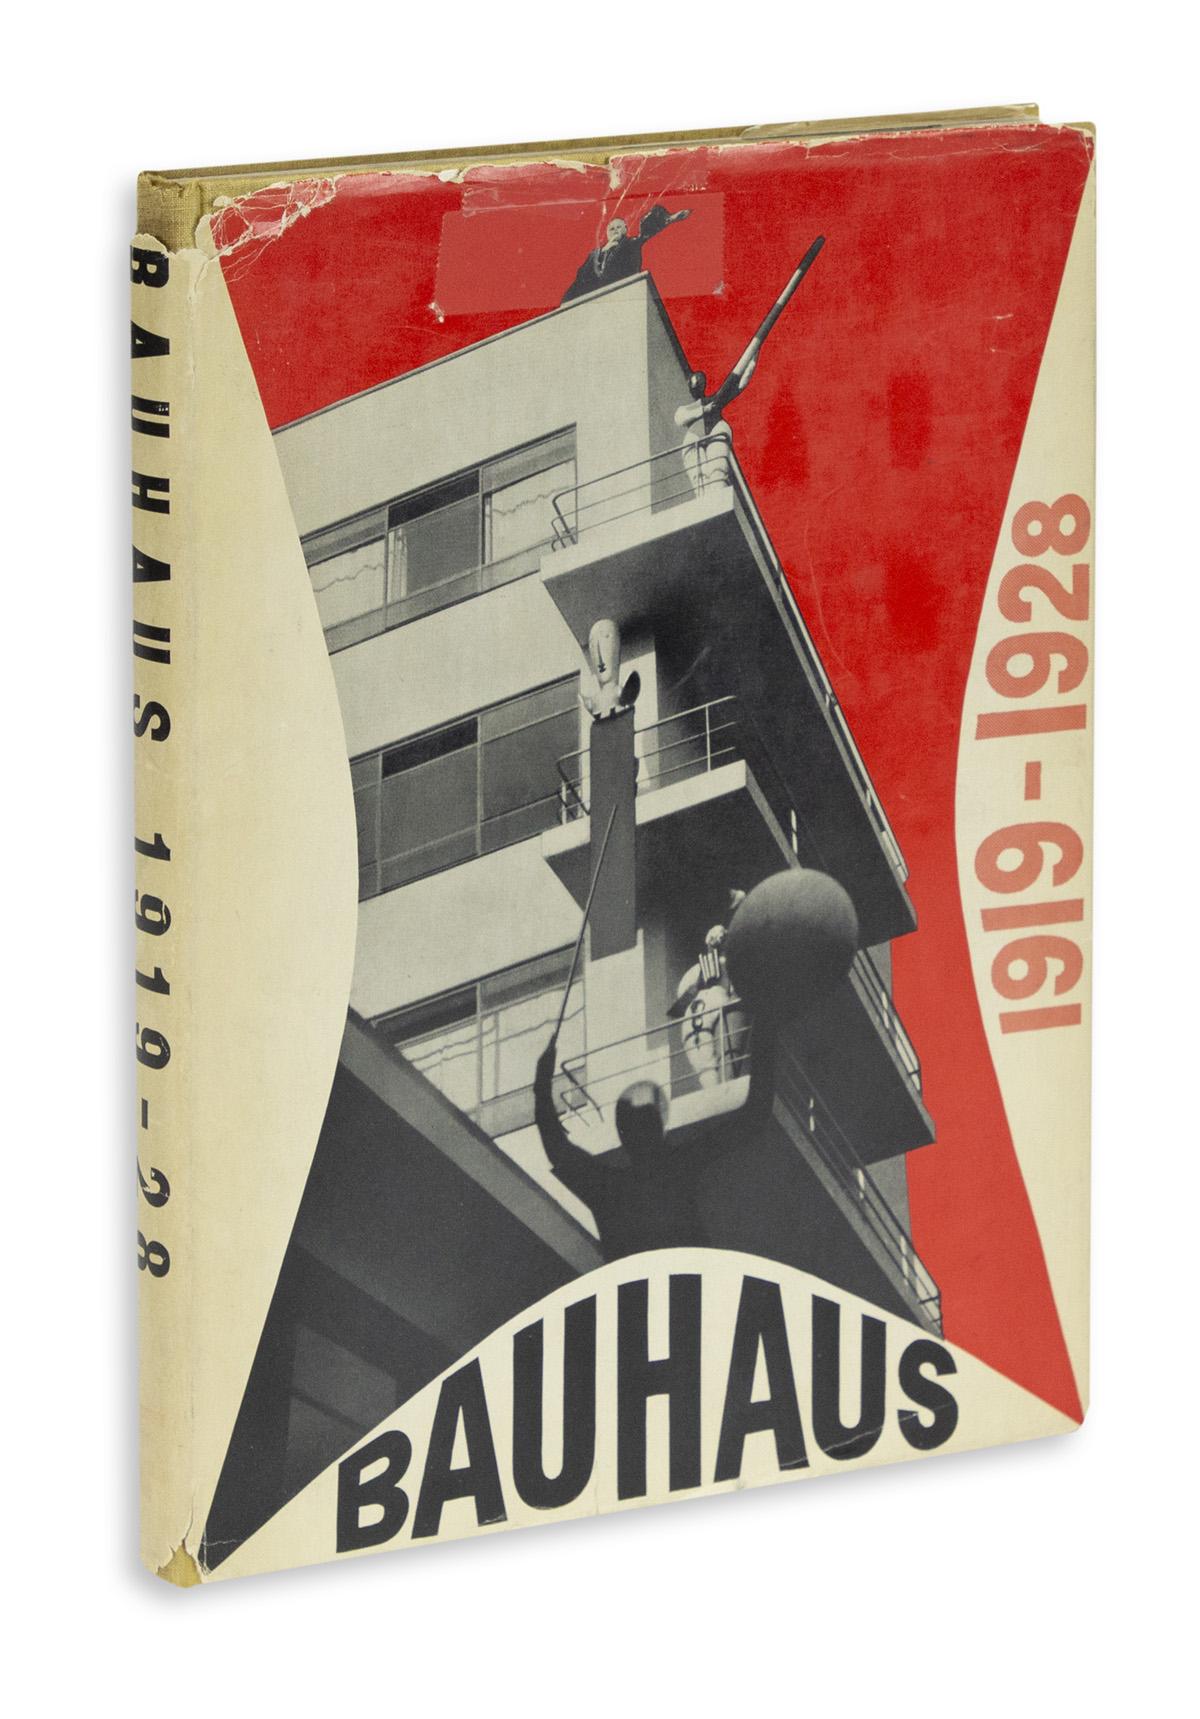 (DESIGN / GRAPHIC DESIGN / BAYER, HERBERT / BAUHAUS.) Bauhaus 1919-1928.